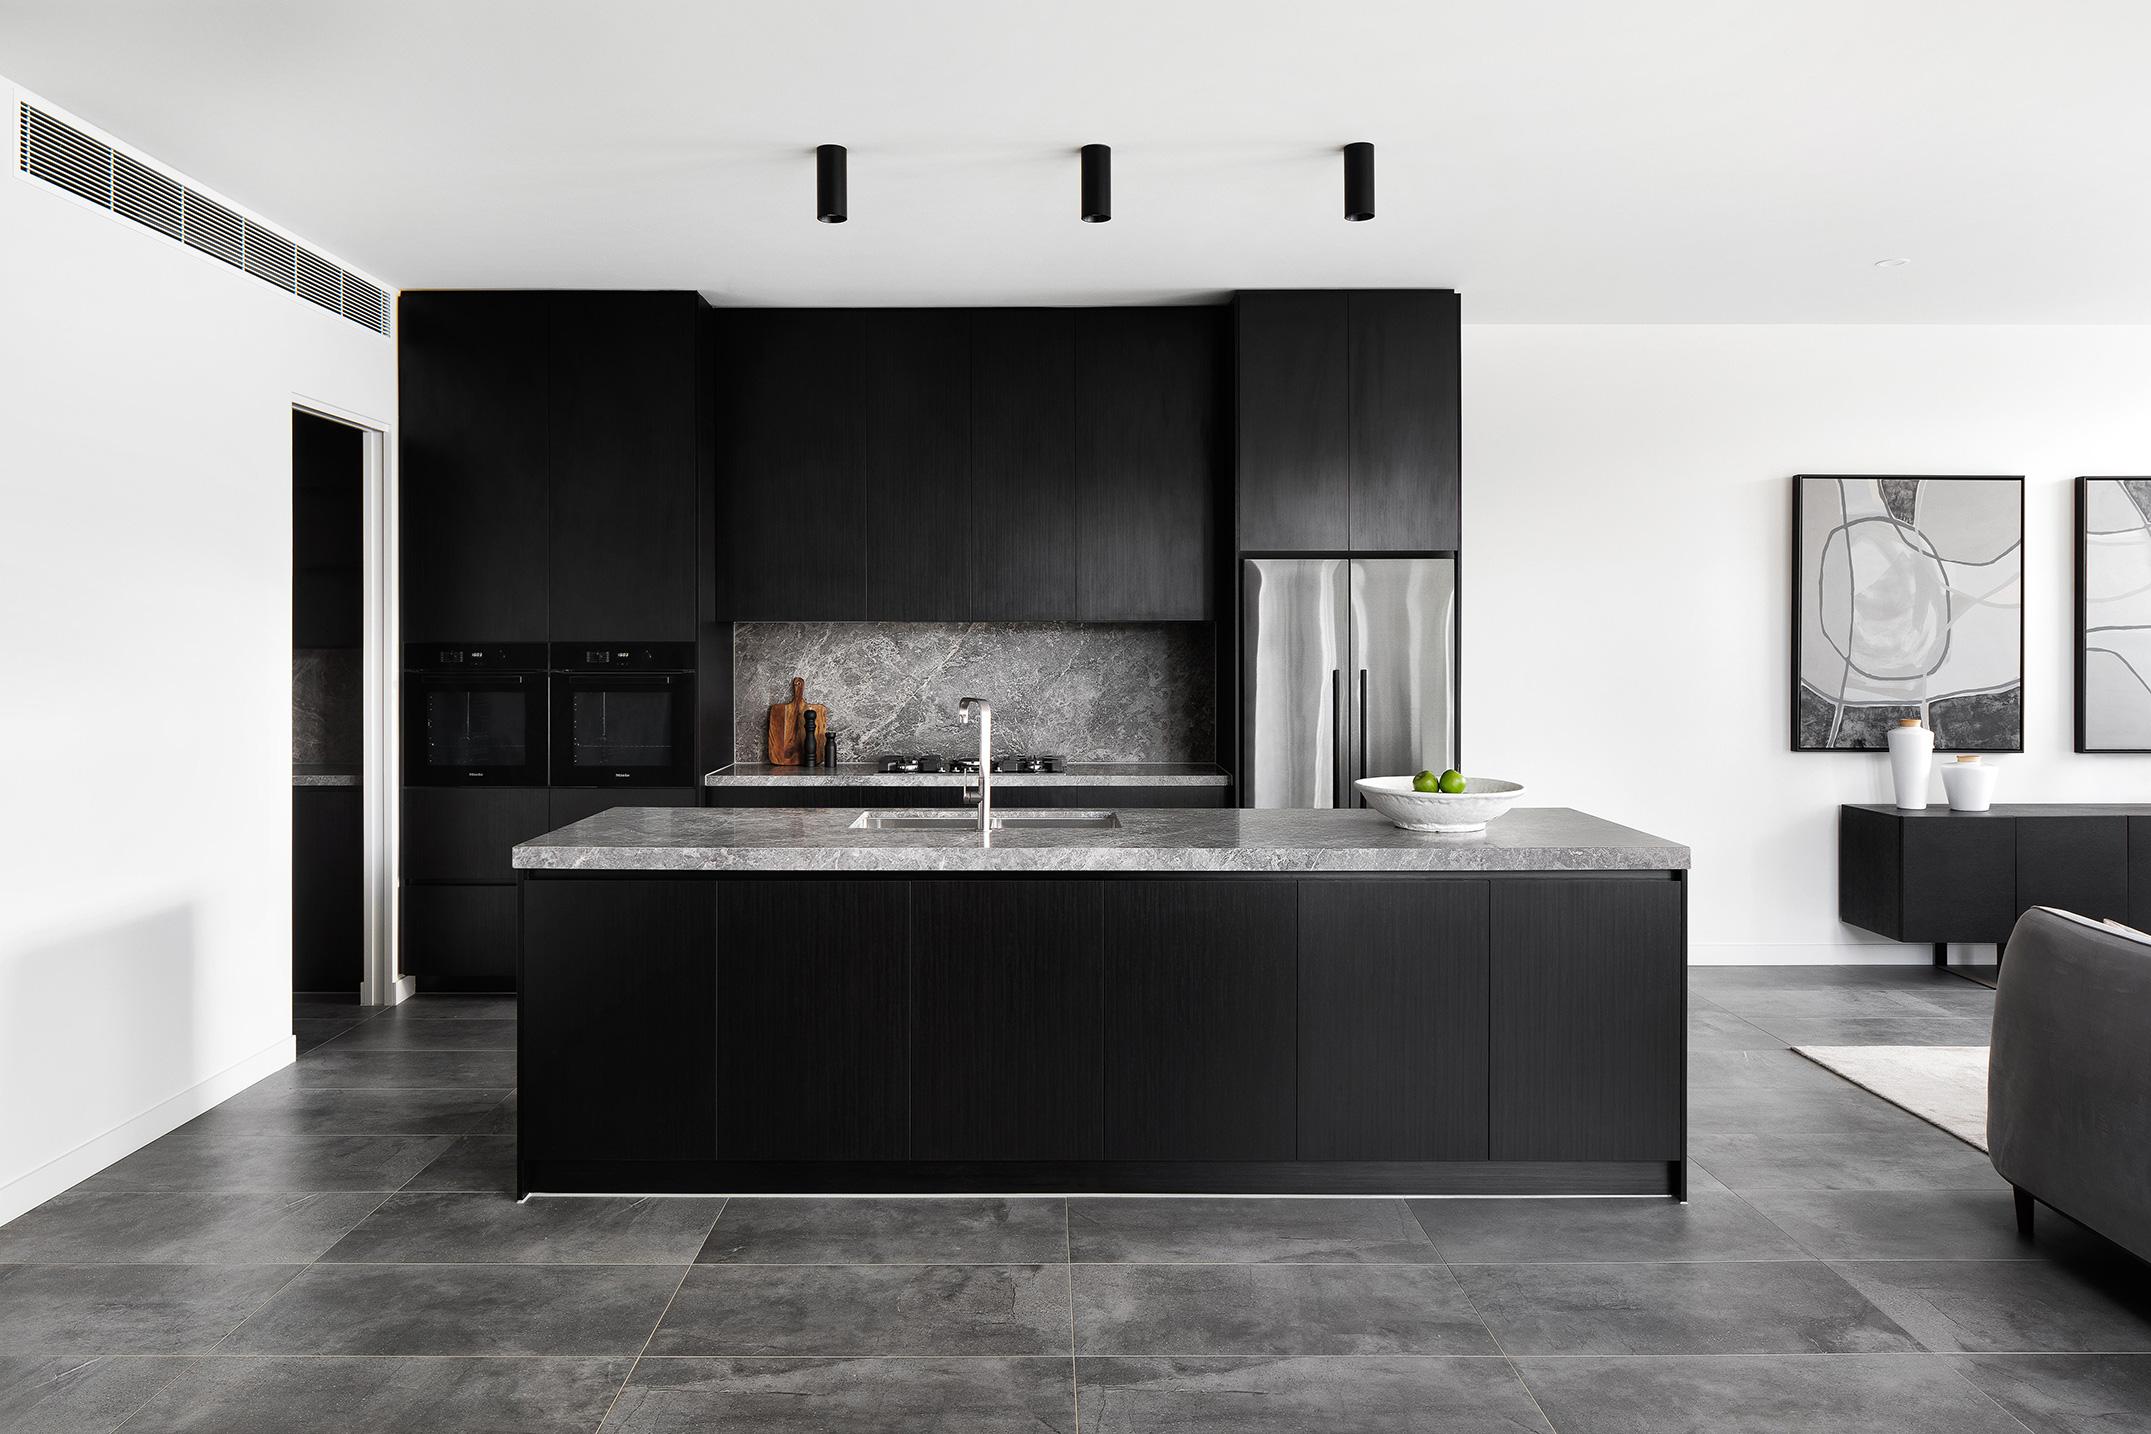 c.kairouz.architects-thornbury-townhouses-interior-kitchen